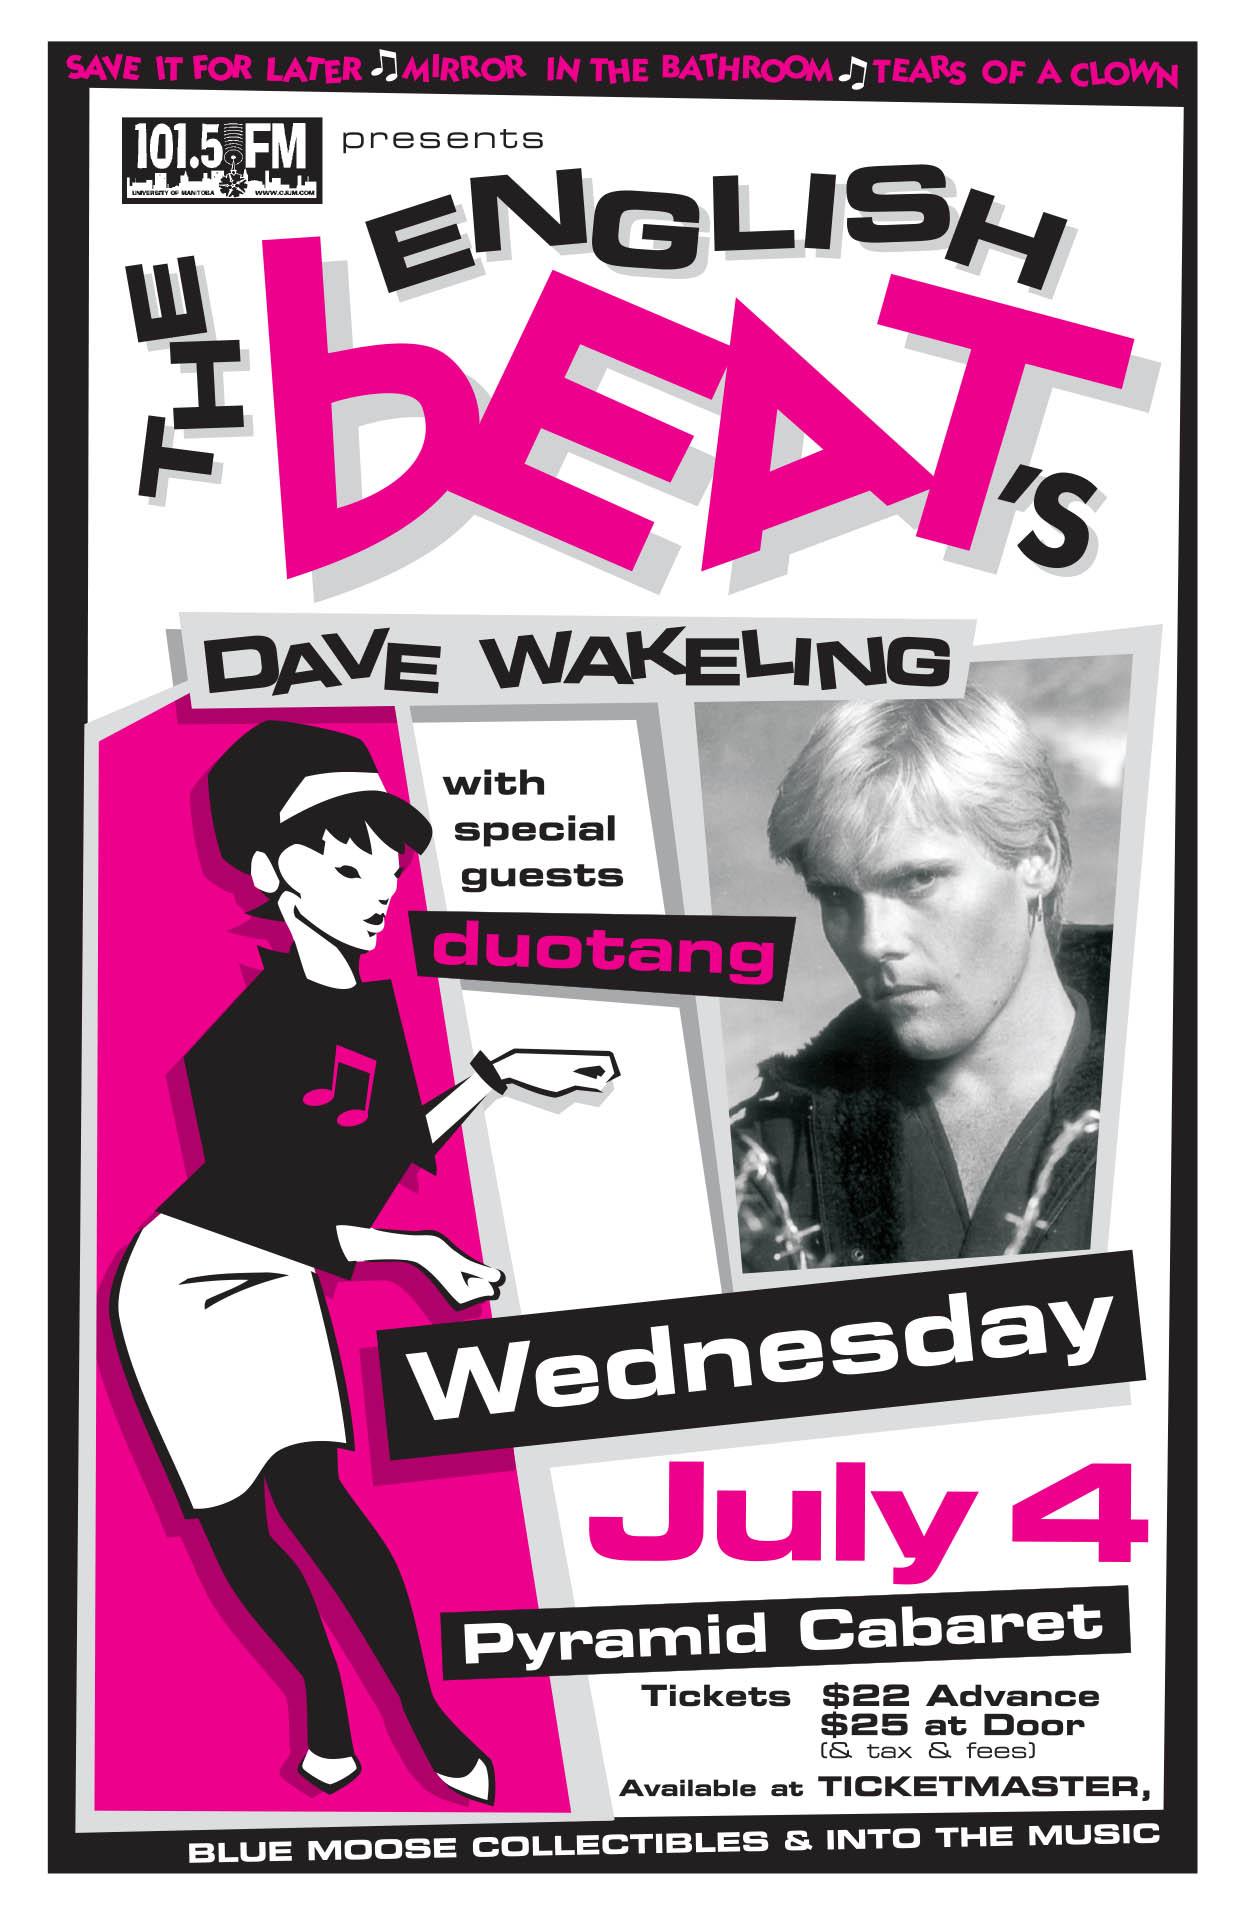 ENGLISH BEAT'S DAVE WAKELING – 2001